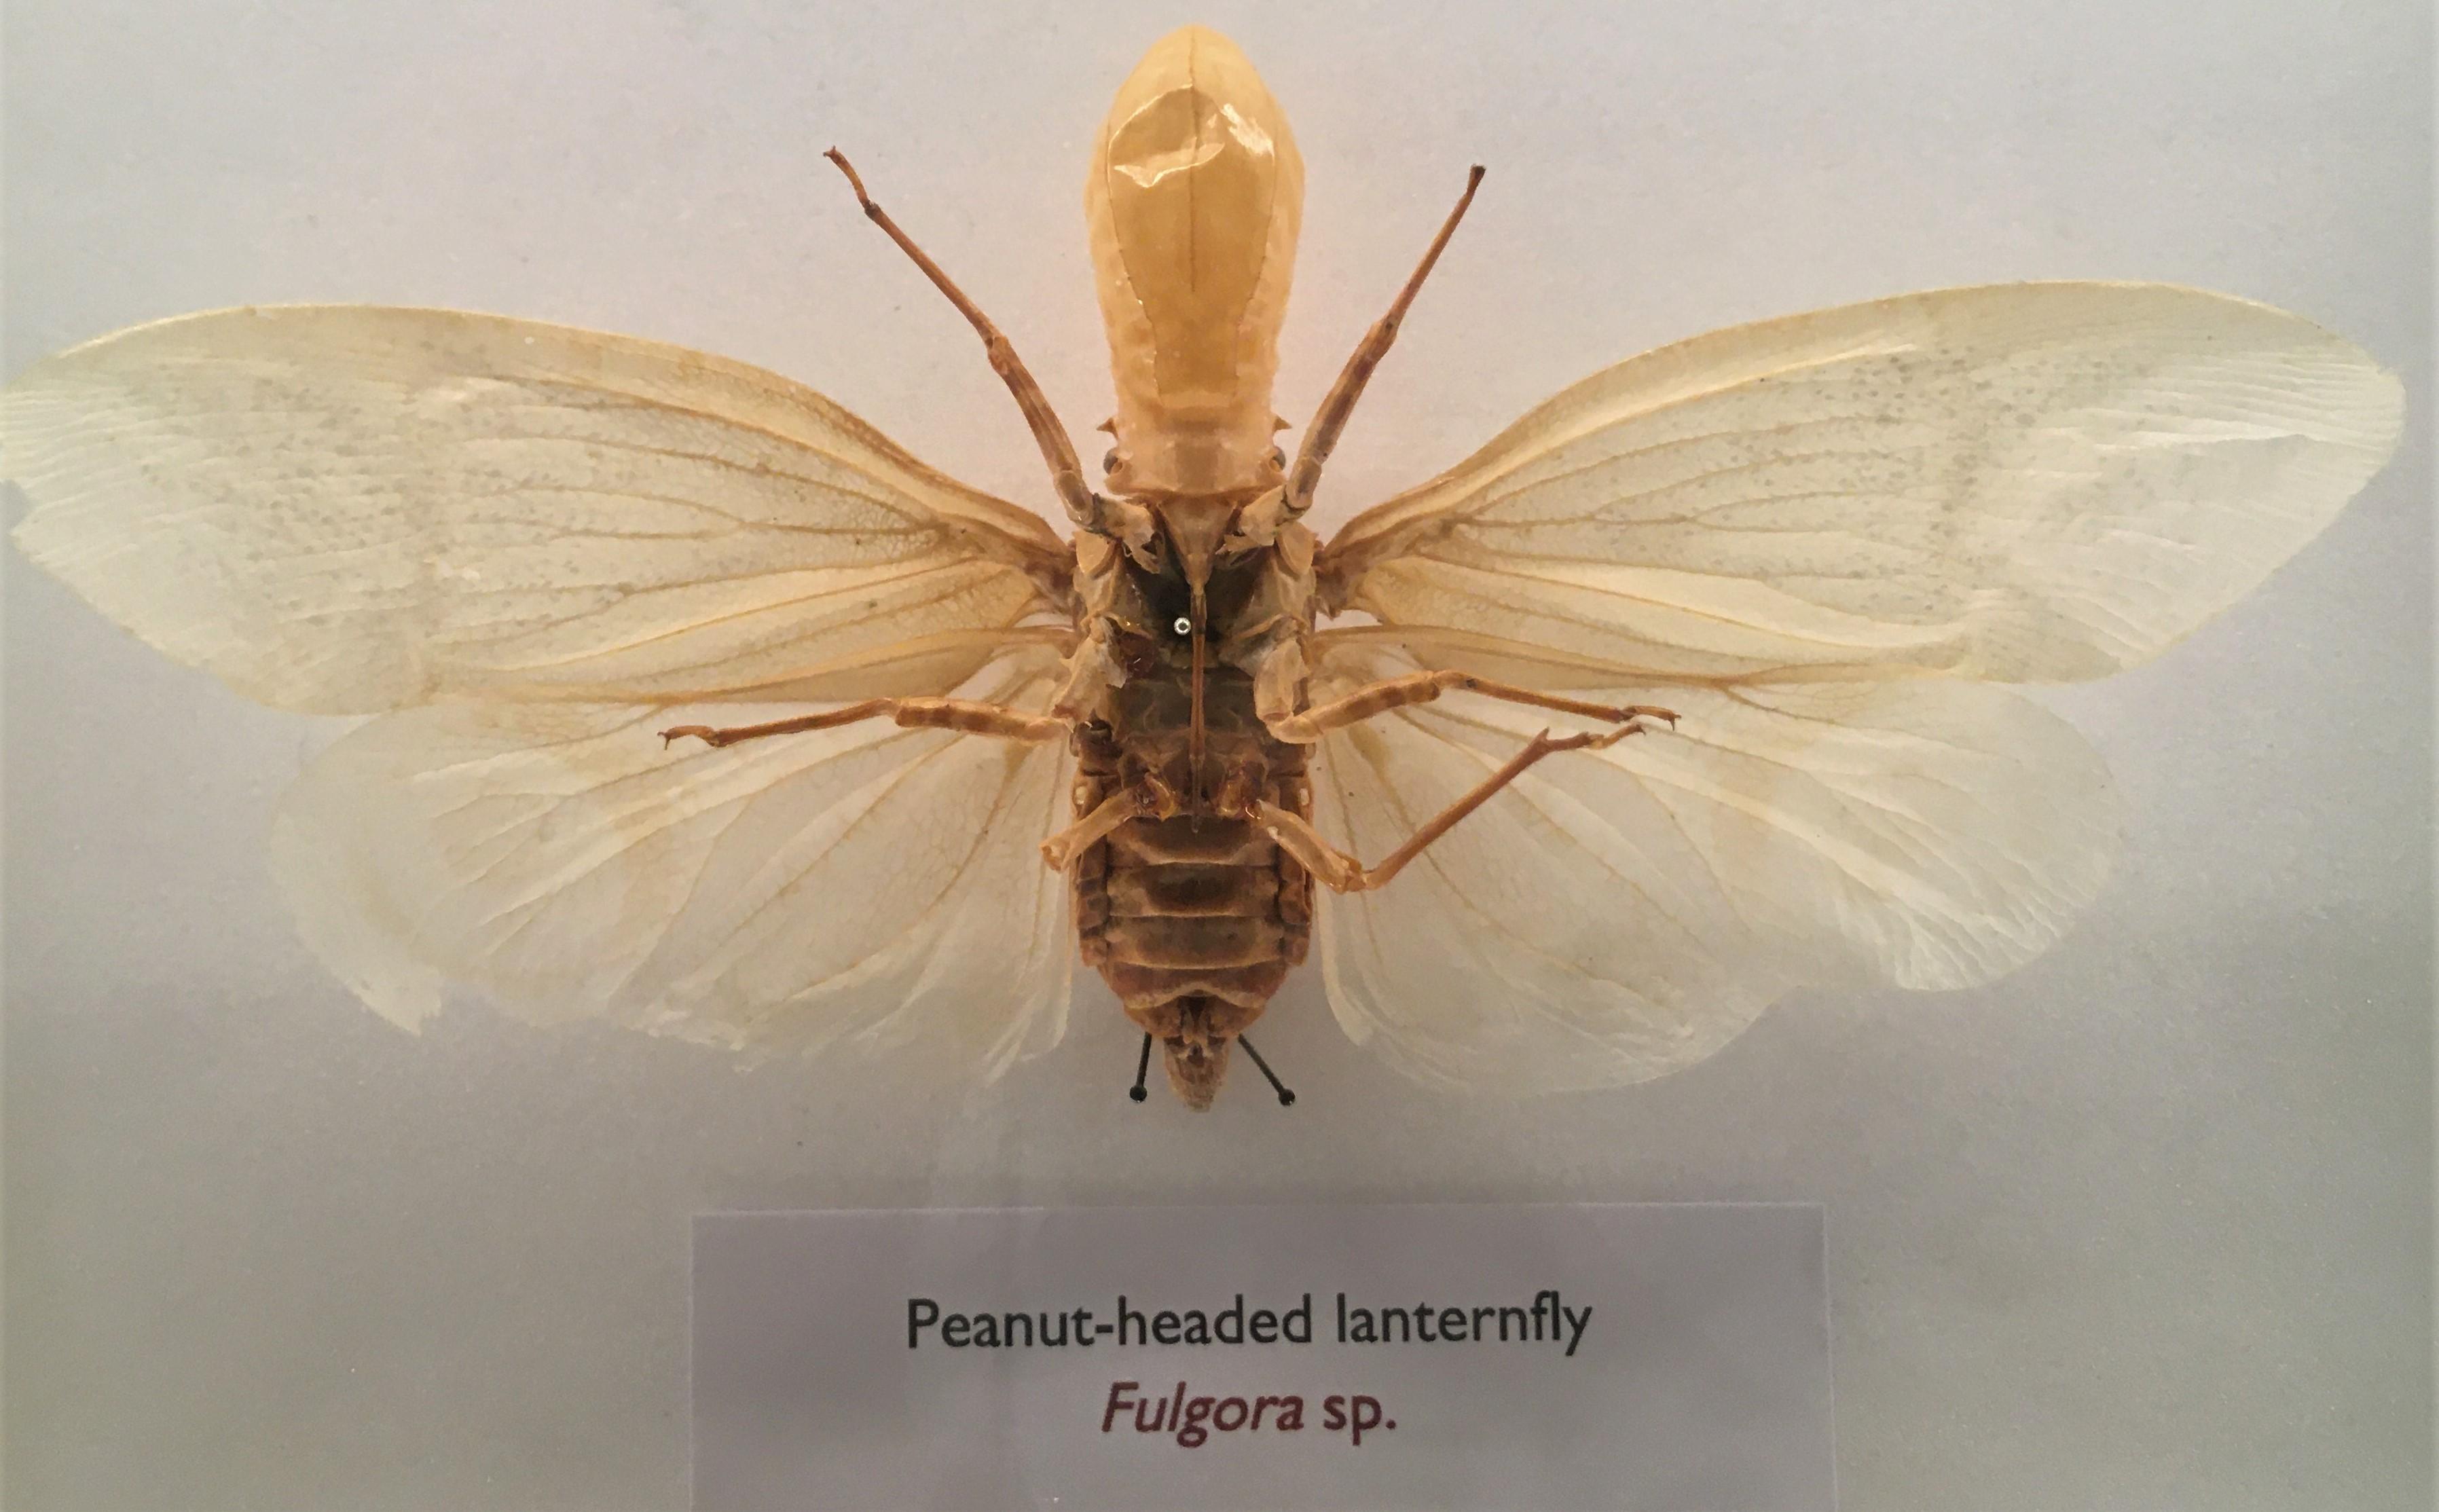 Peanut-headed lanternfly specimen